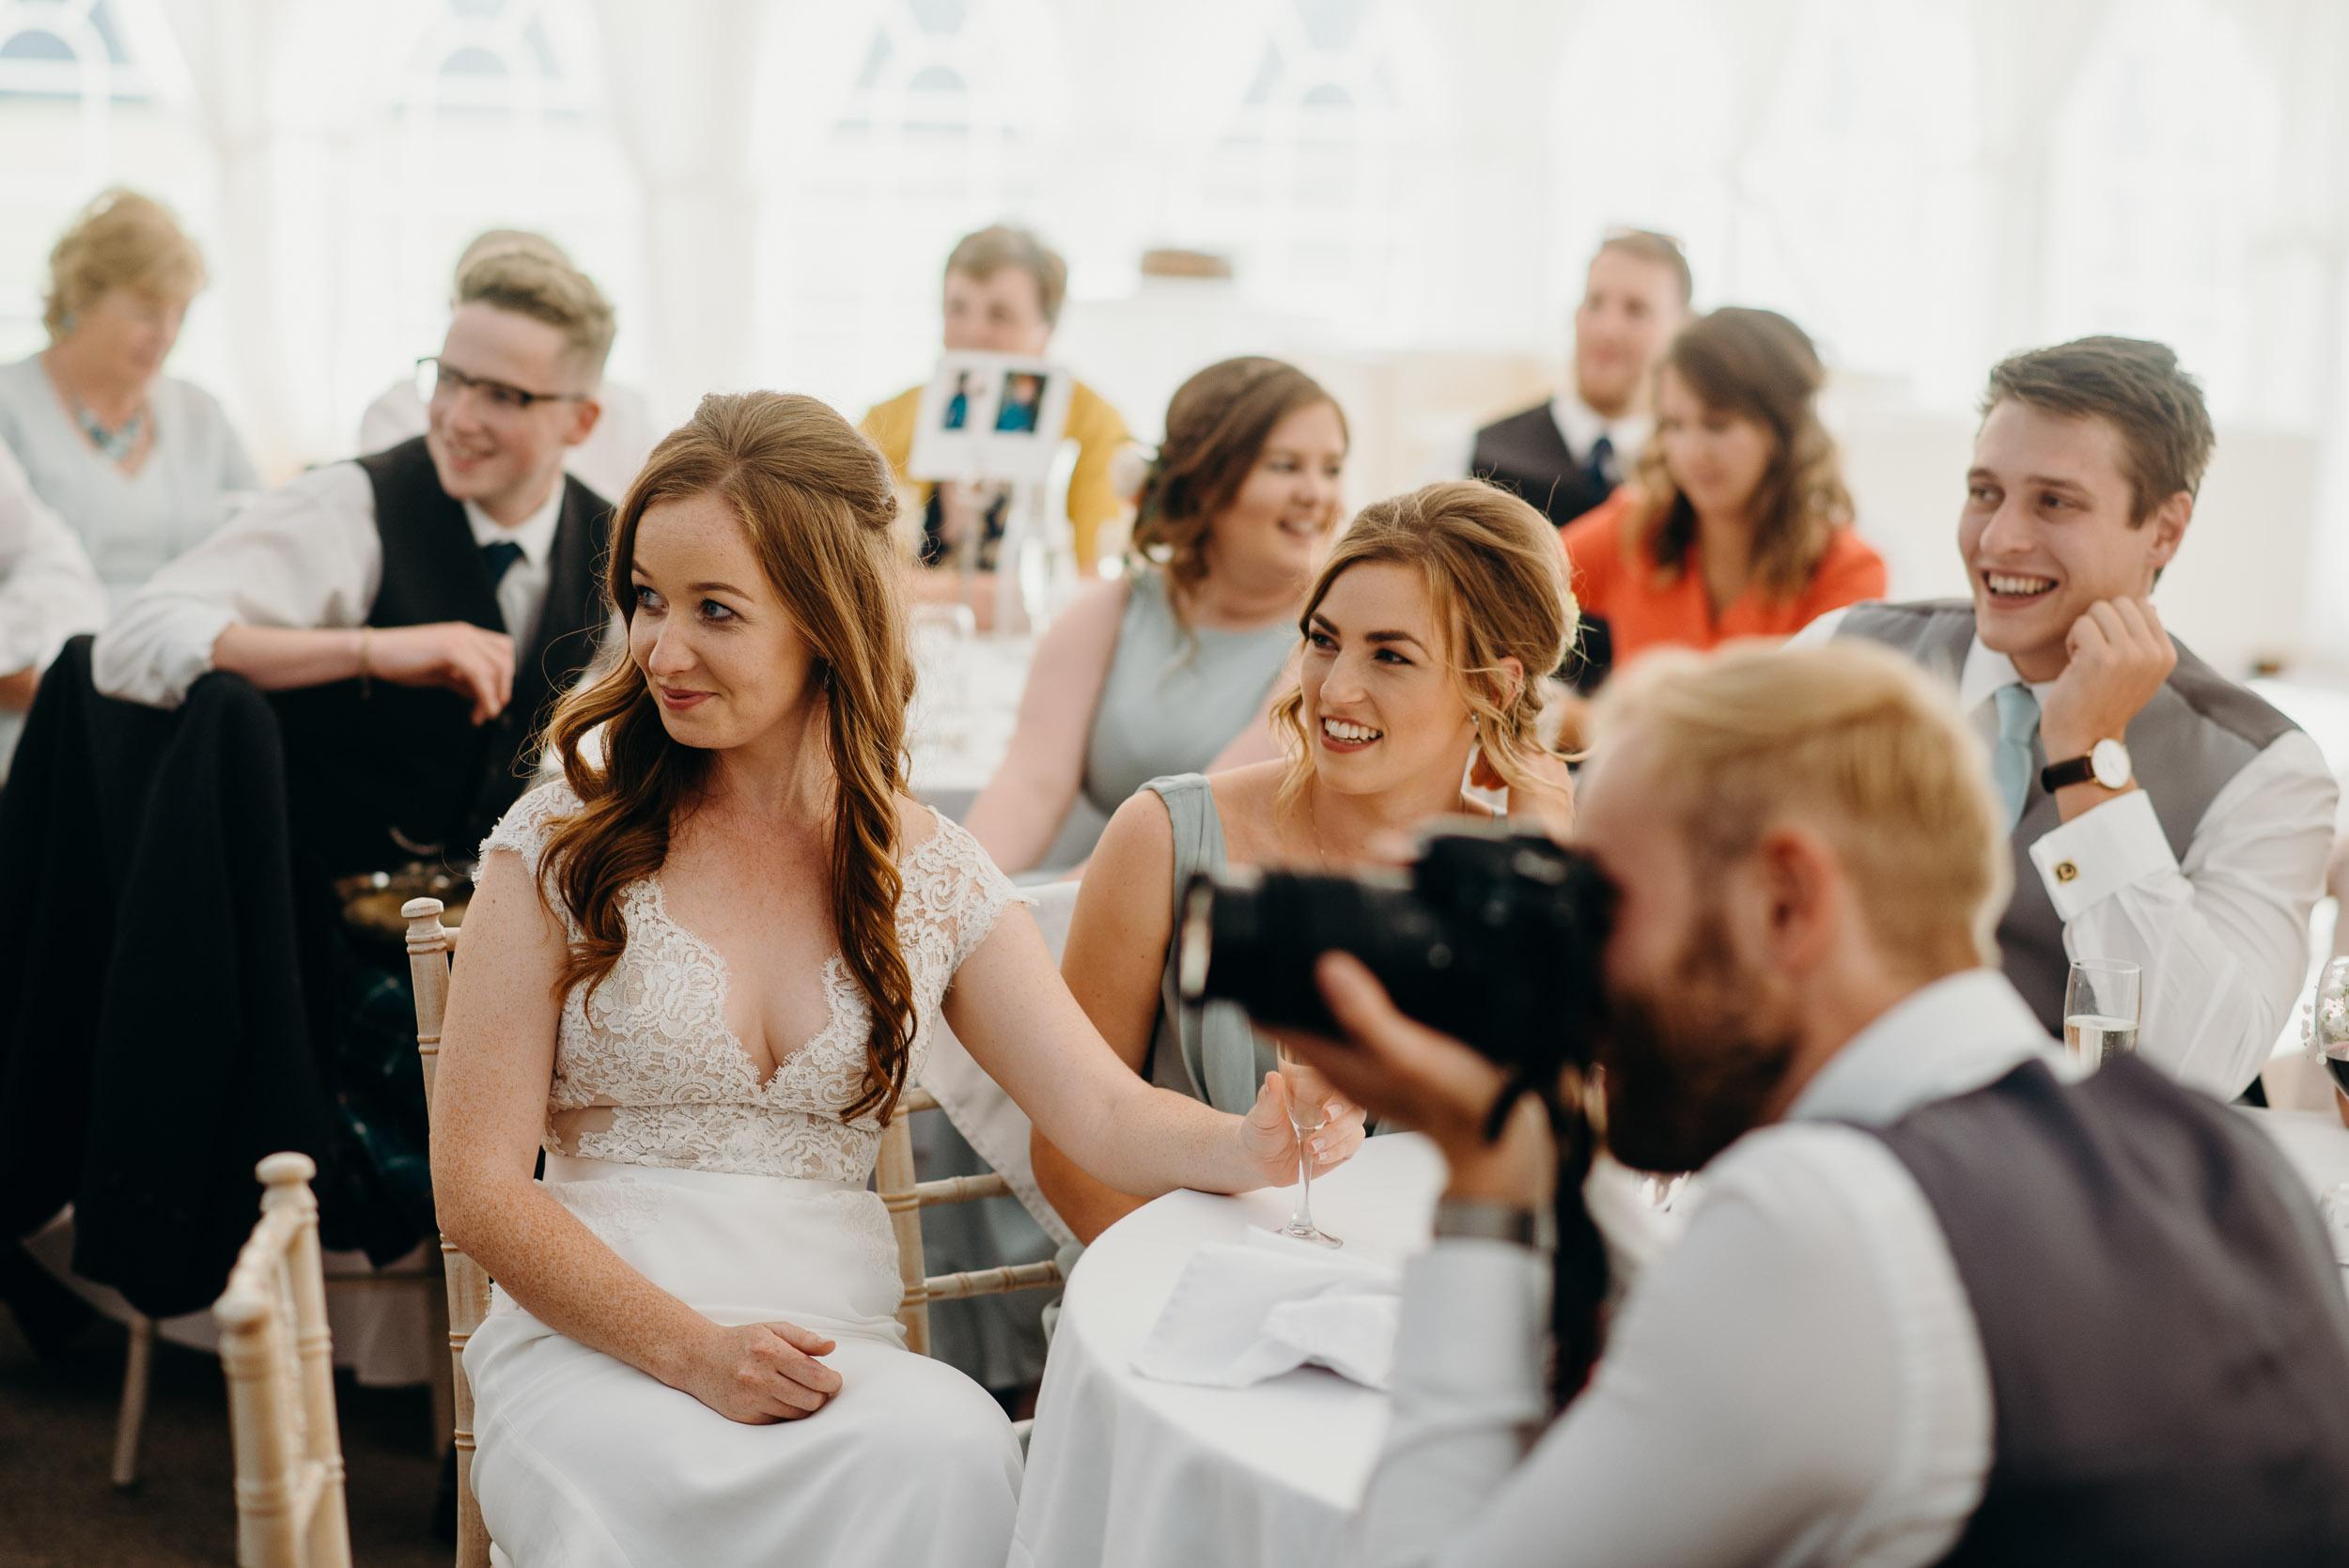 drenagh estate wedding photography-110.jpg